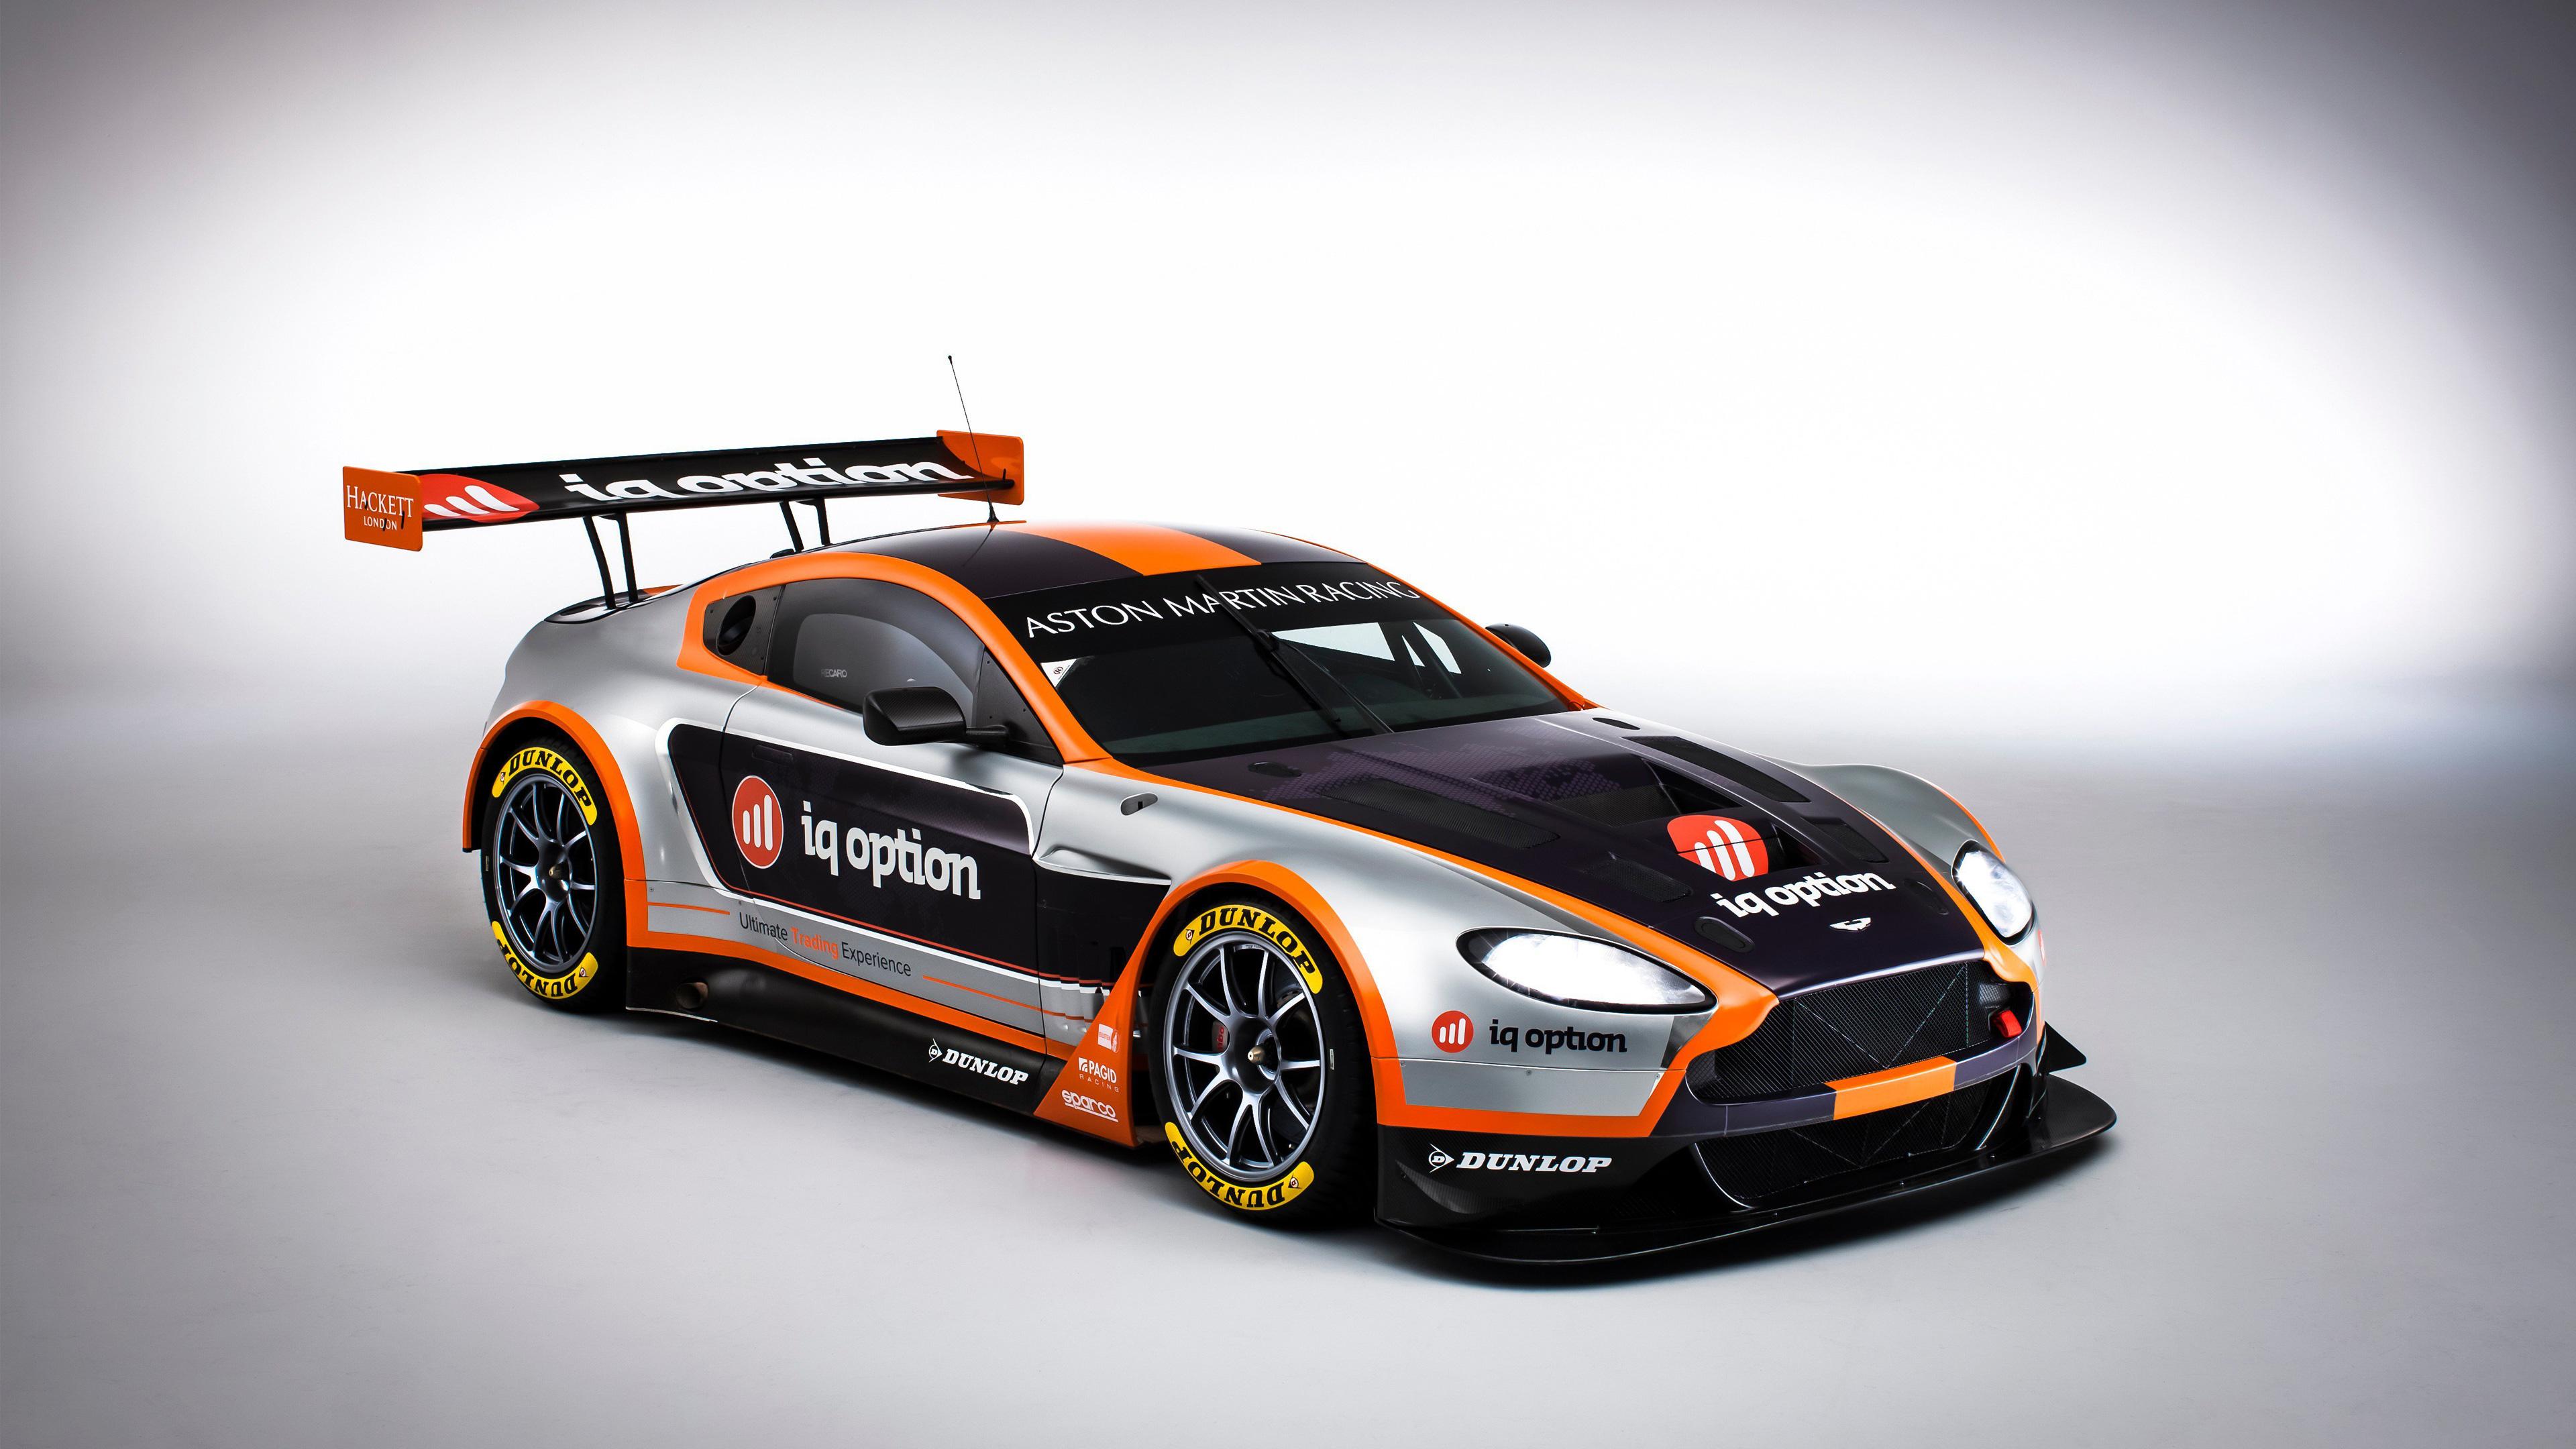 Aston Martin Racing Car Wallpaper | HD Car Wallpapers| ID #6392